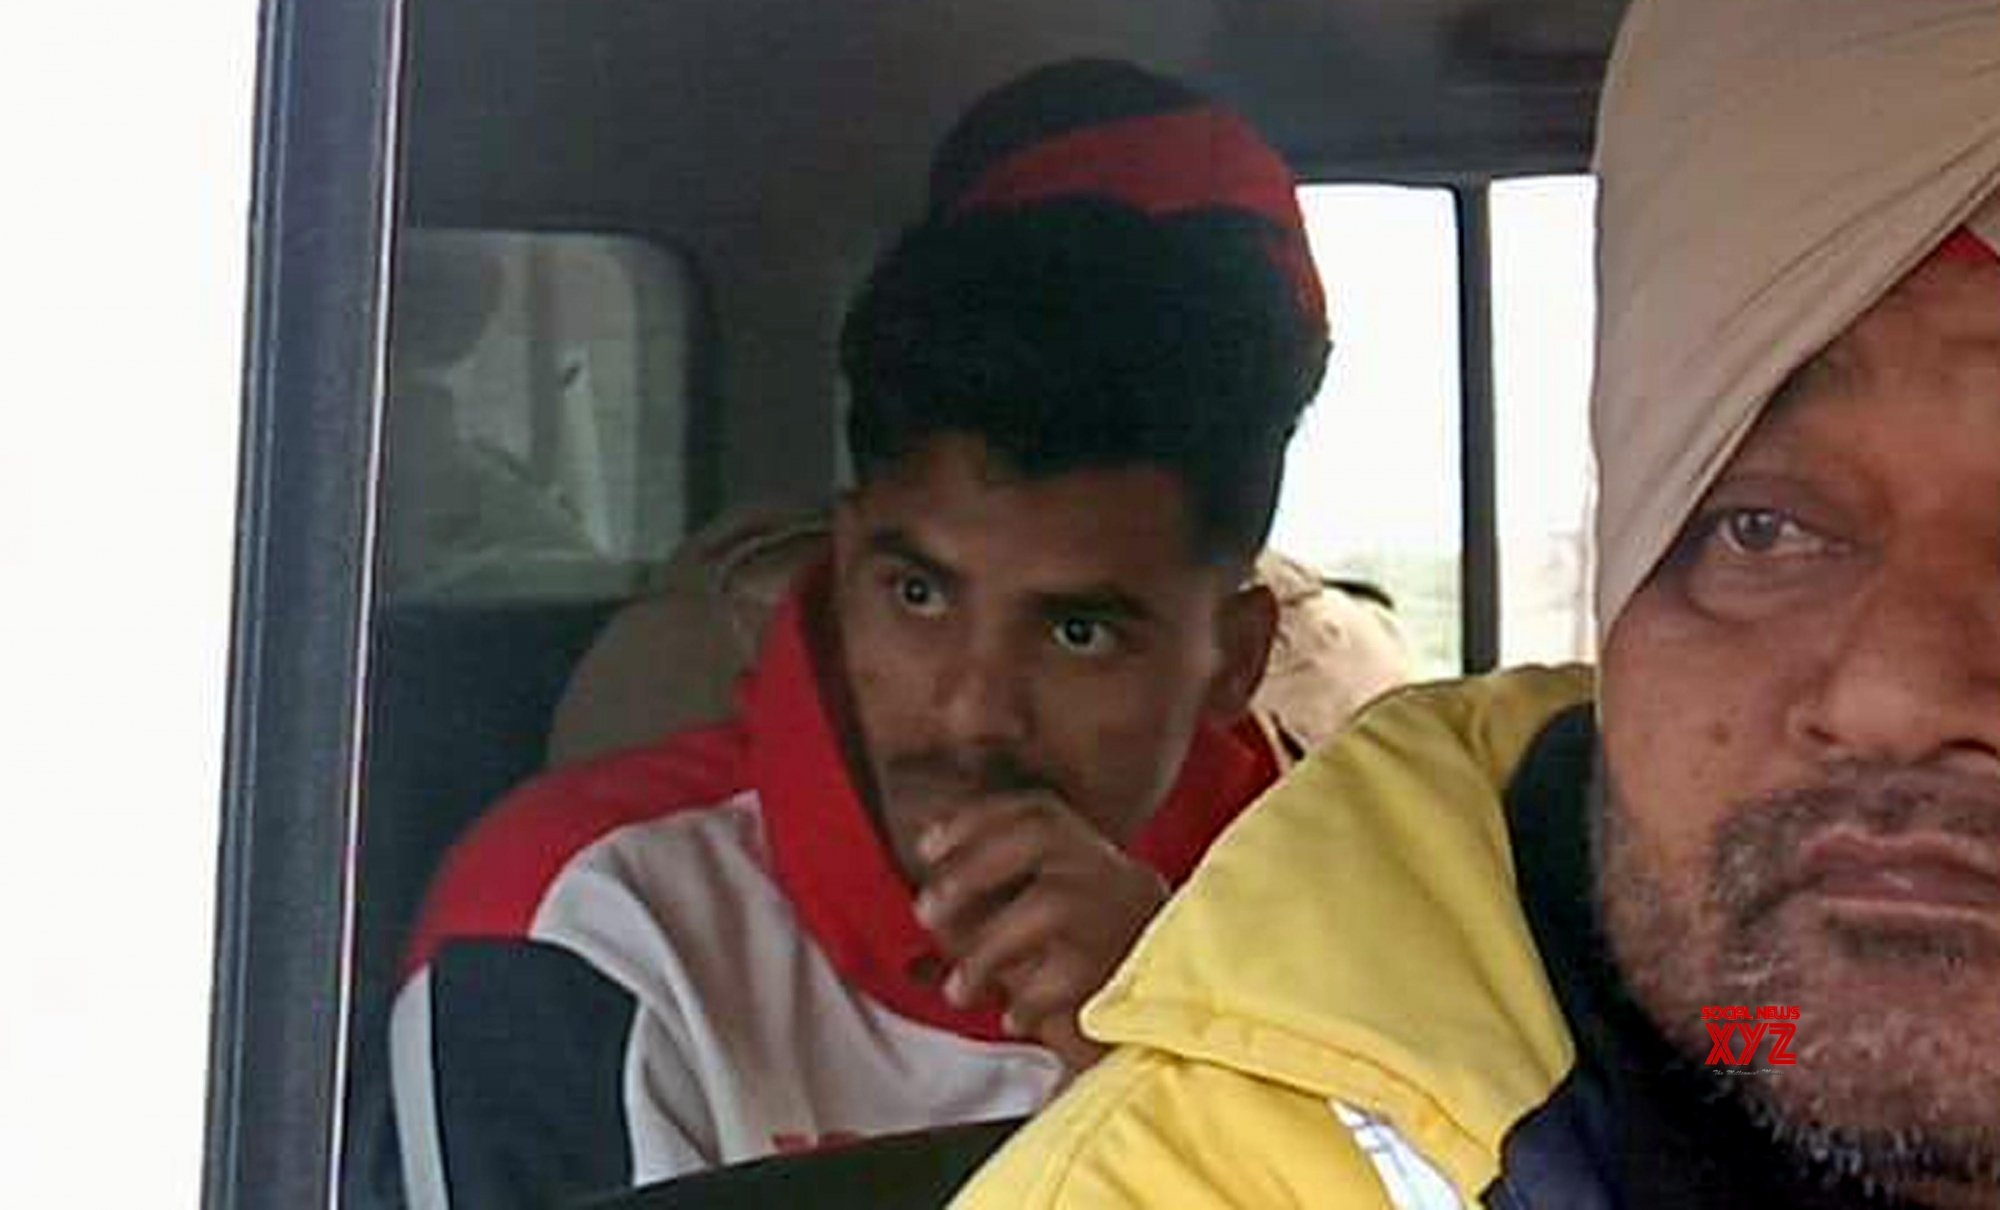 Attari: Will love to come back to India, says repatriated Pak boy #Gallery